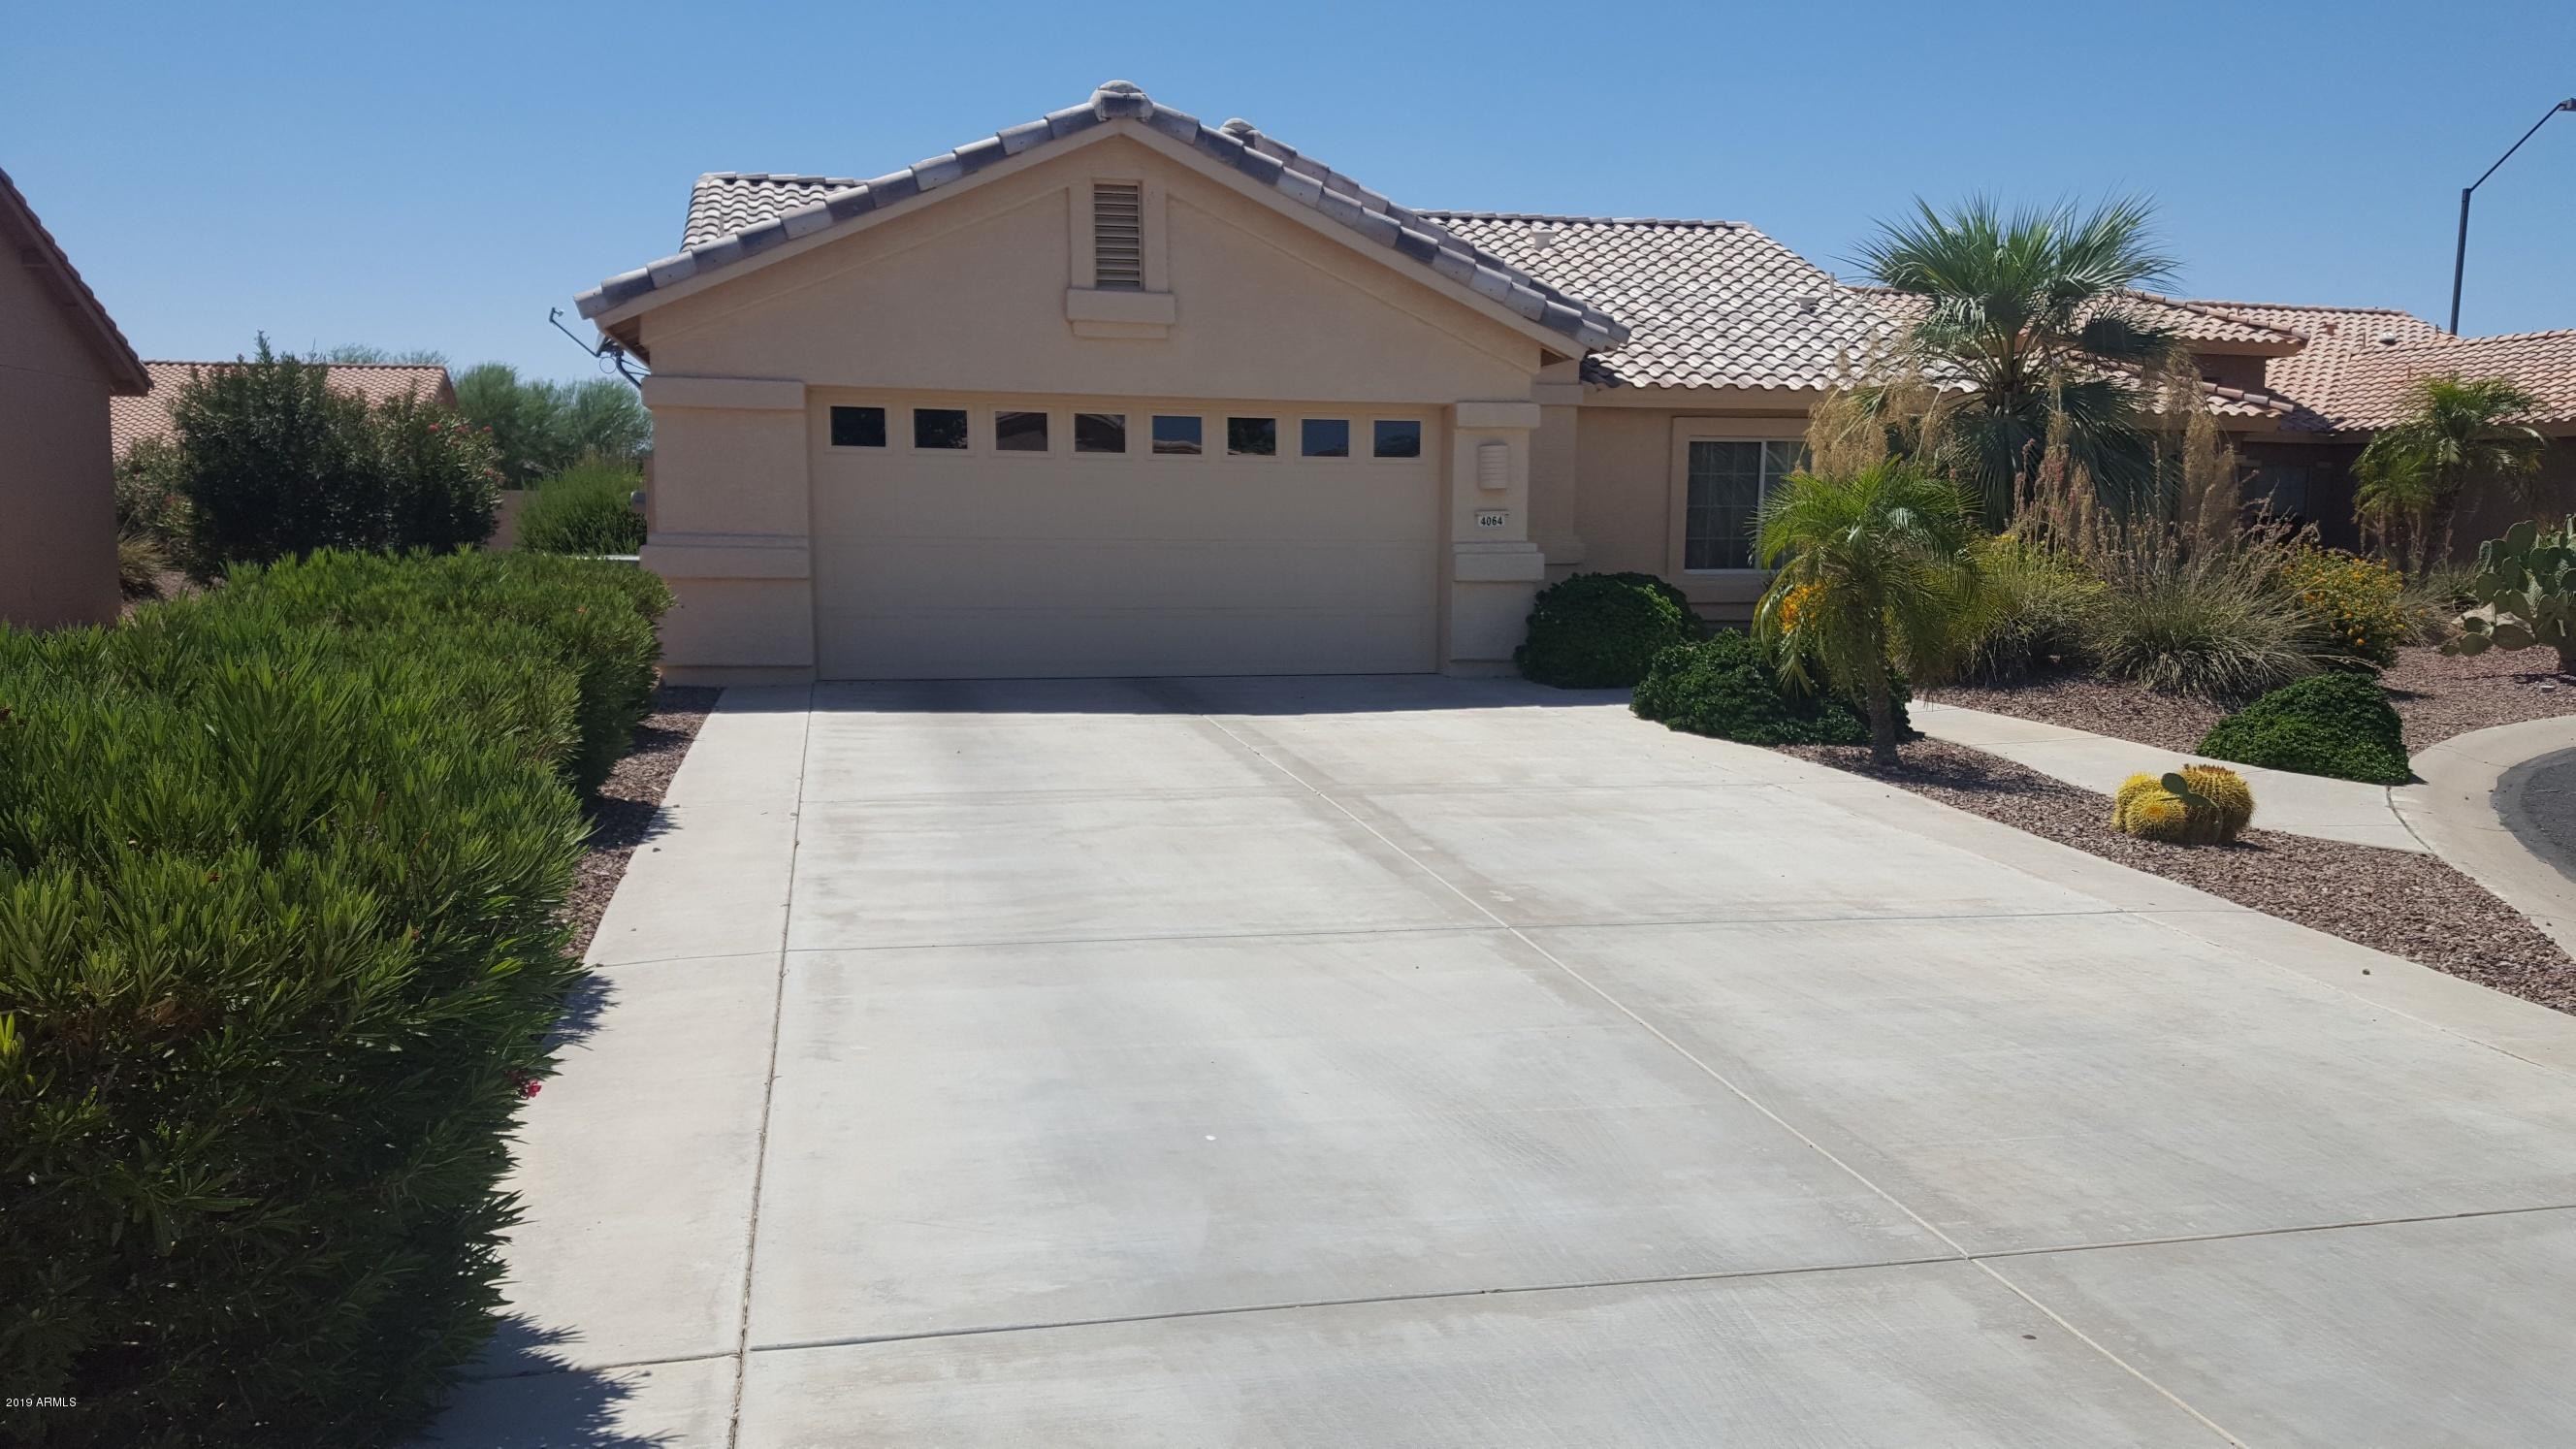 Photo of 4064 N 160TH Avenue, Goodyear, AZ 85395